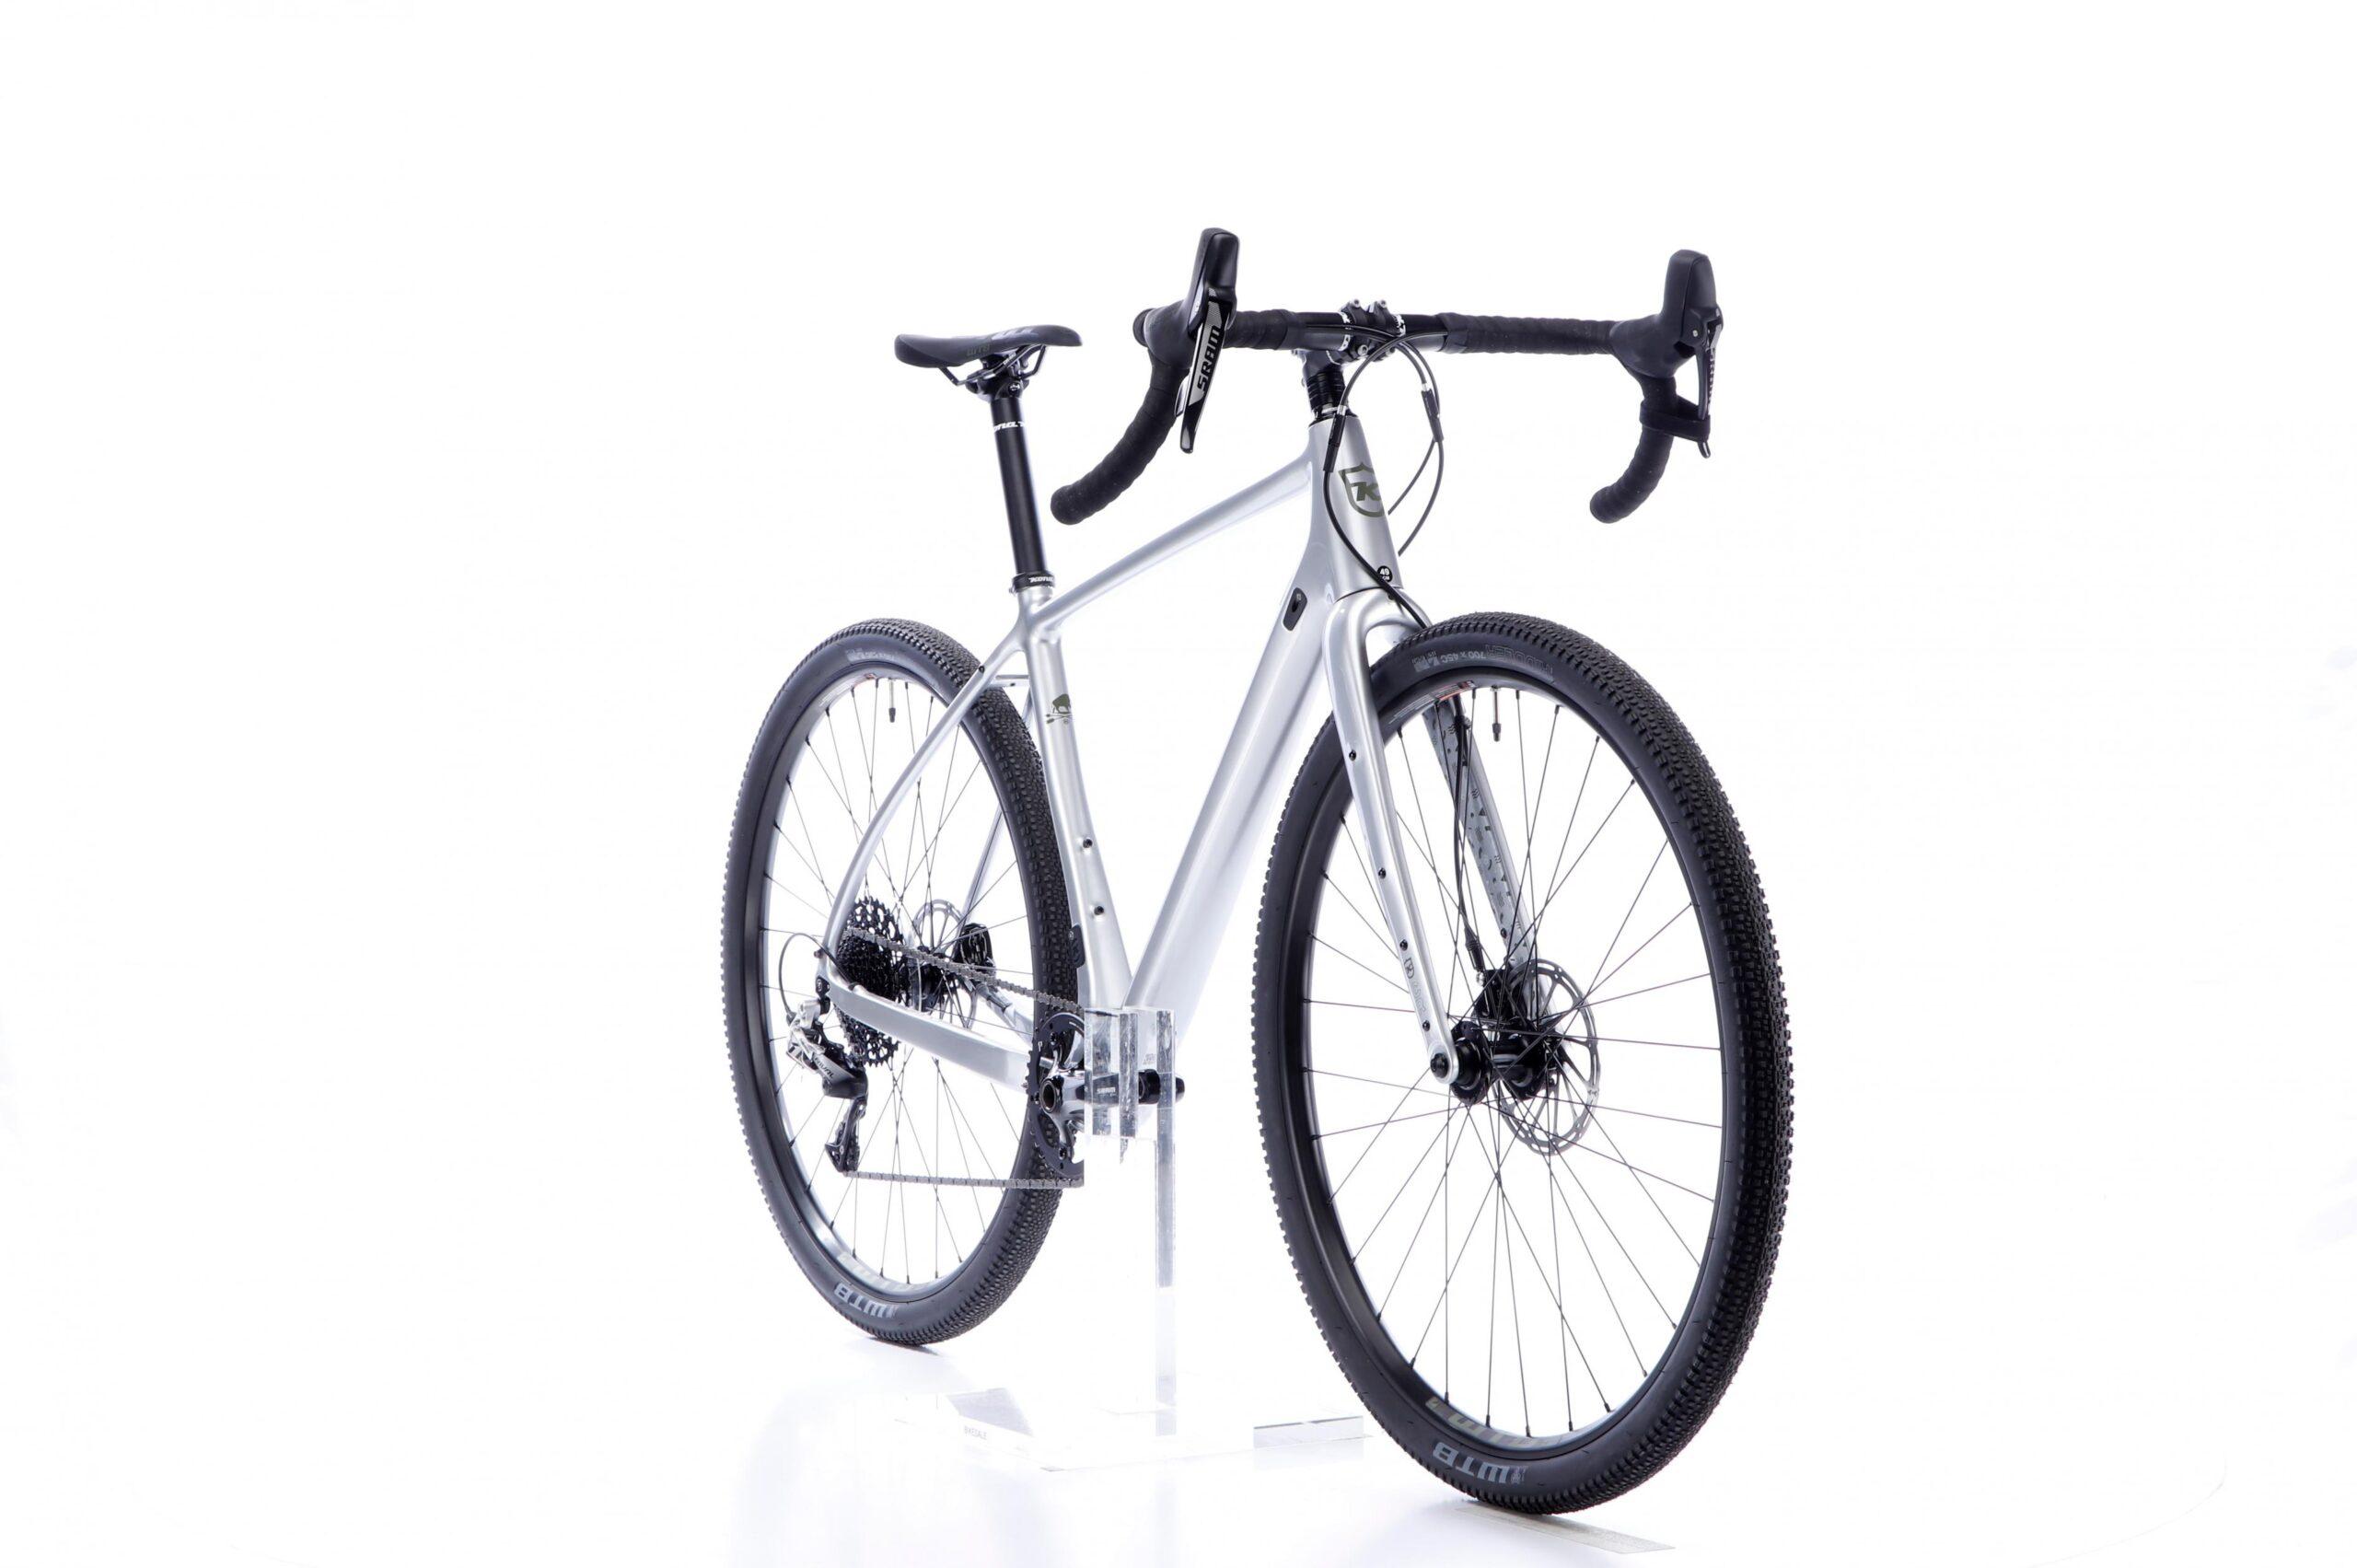 Kona_Libre_Carbon_Gravel-__Cyclocross_Bikes_3p0K03eXlNkLAm